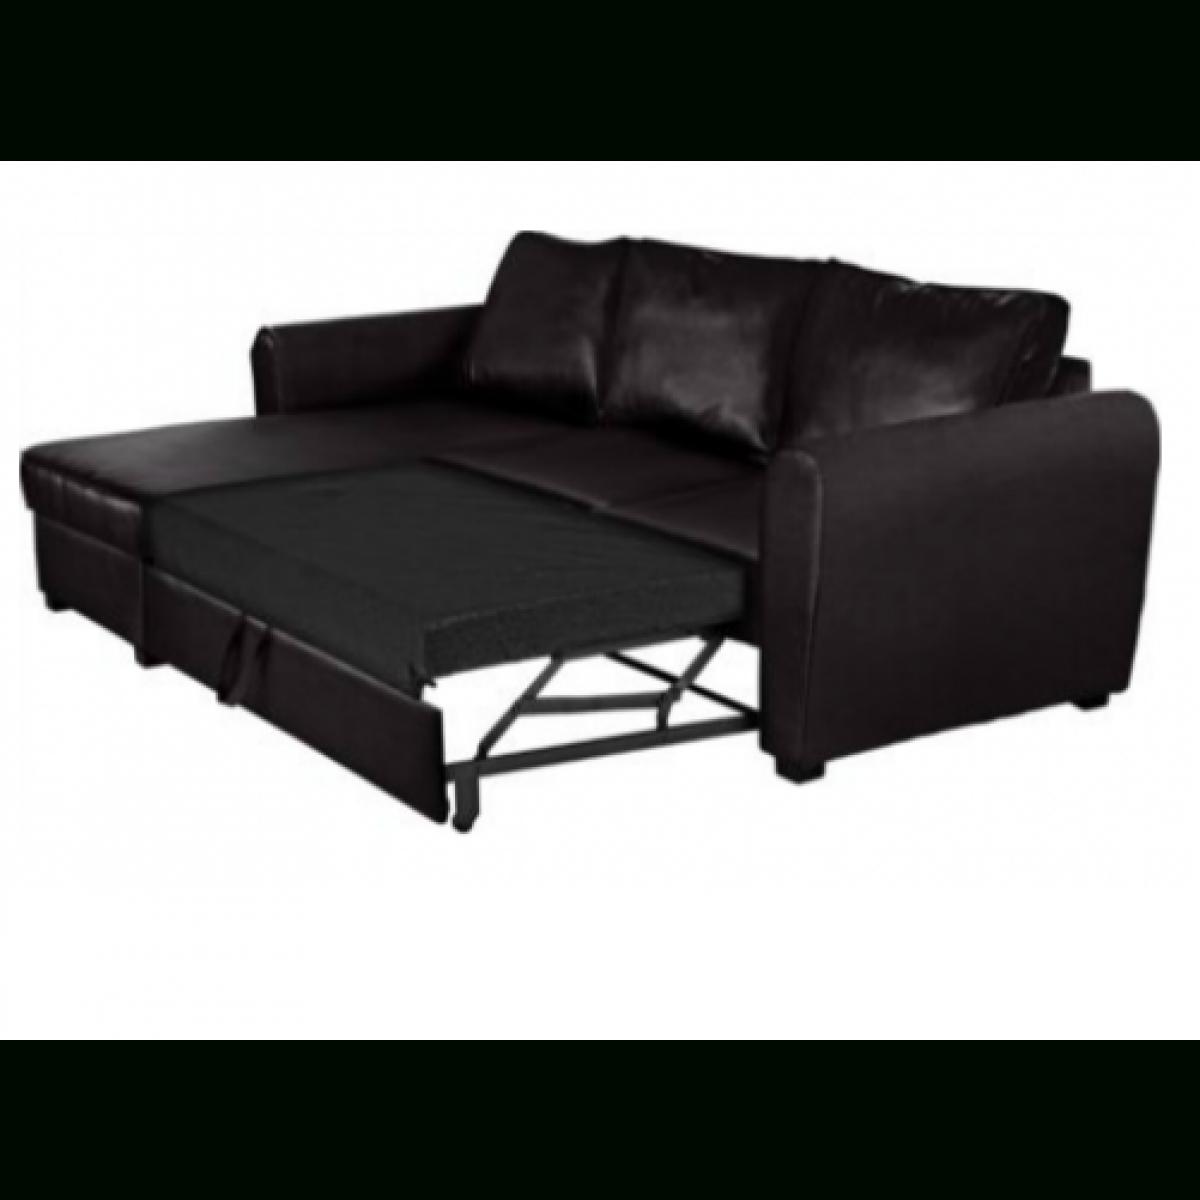 New Siena Fabric Corner Sofa Bed With Storage – Charcoal With Leather Sofa Beds With Storage (Image 16 of 20)